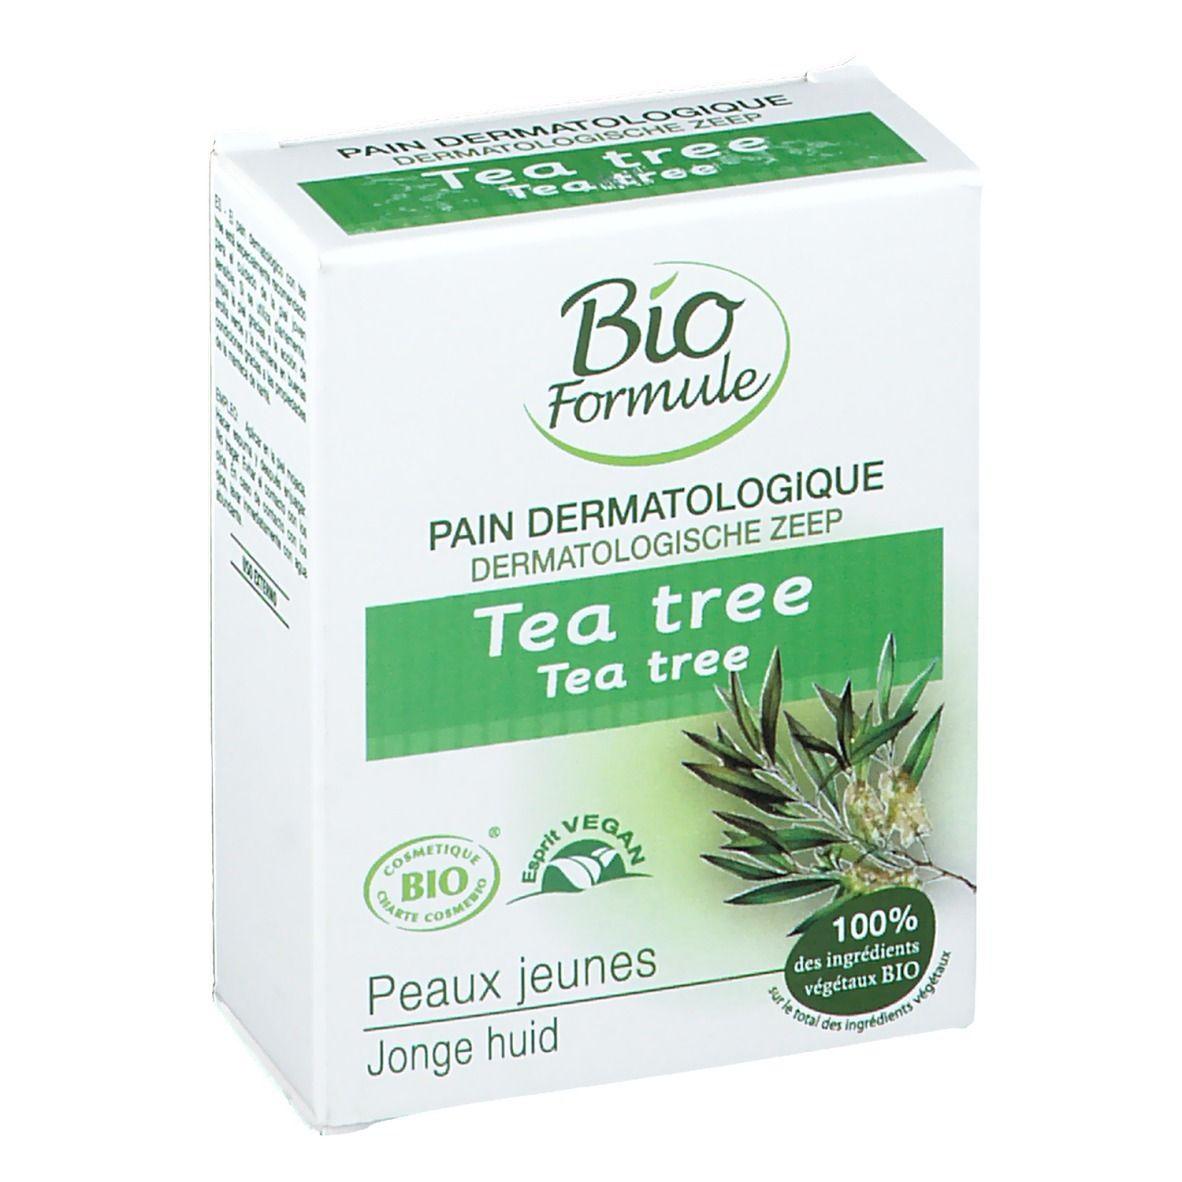 BioFormule Bio Formule Pain dermatologique Tea tree g savon